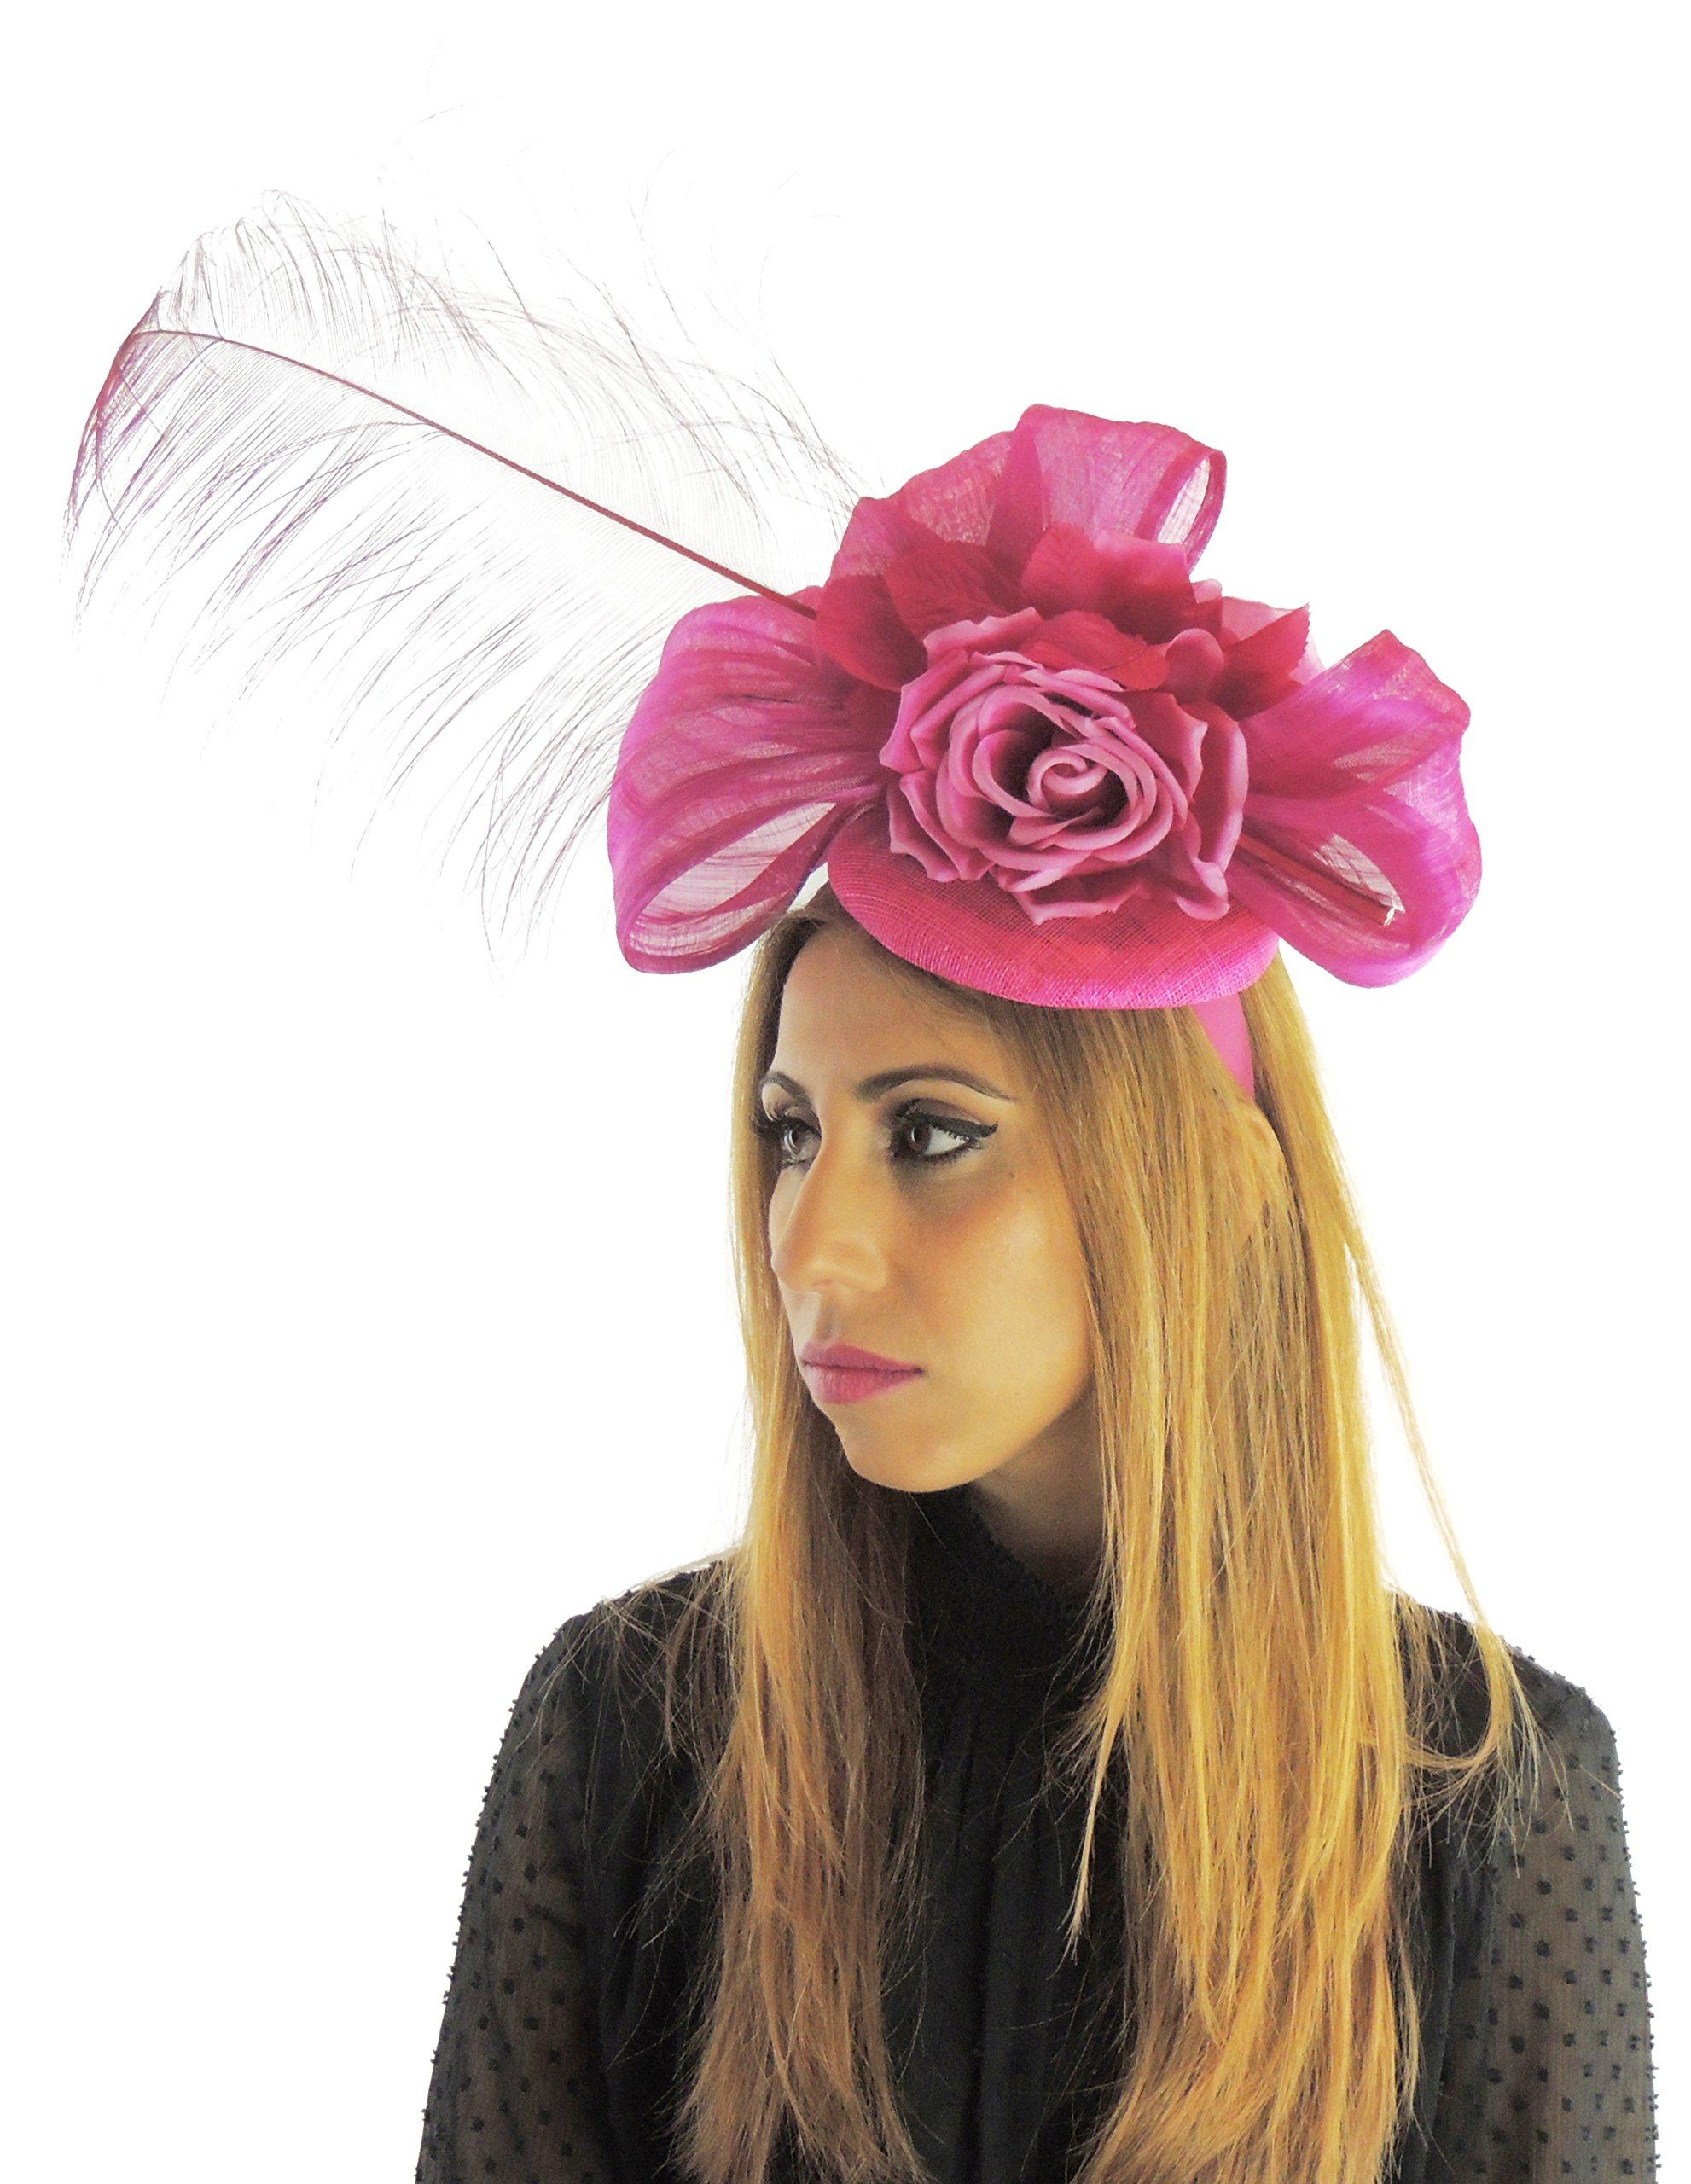 Hats By Cressida Silk Sinamay & Silk Flower Elegant Ladies Ascot Wedding Fascinator Hat Cerise Pink